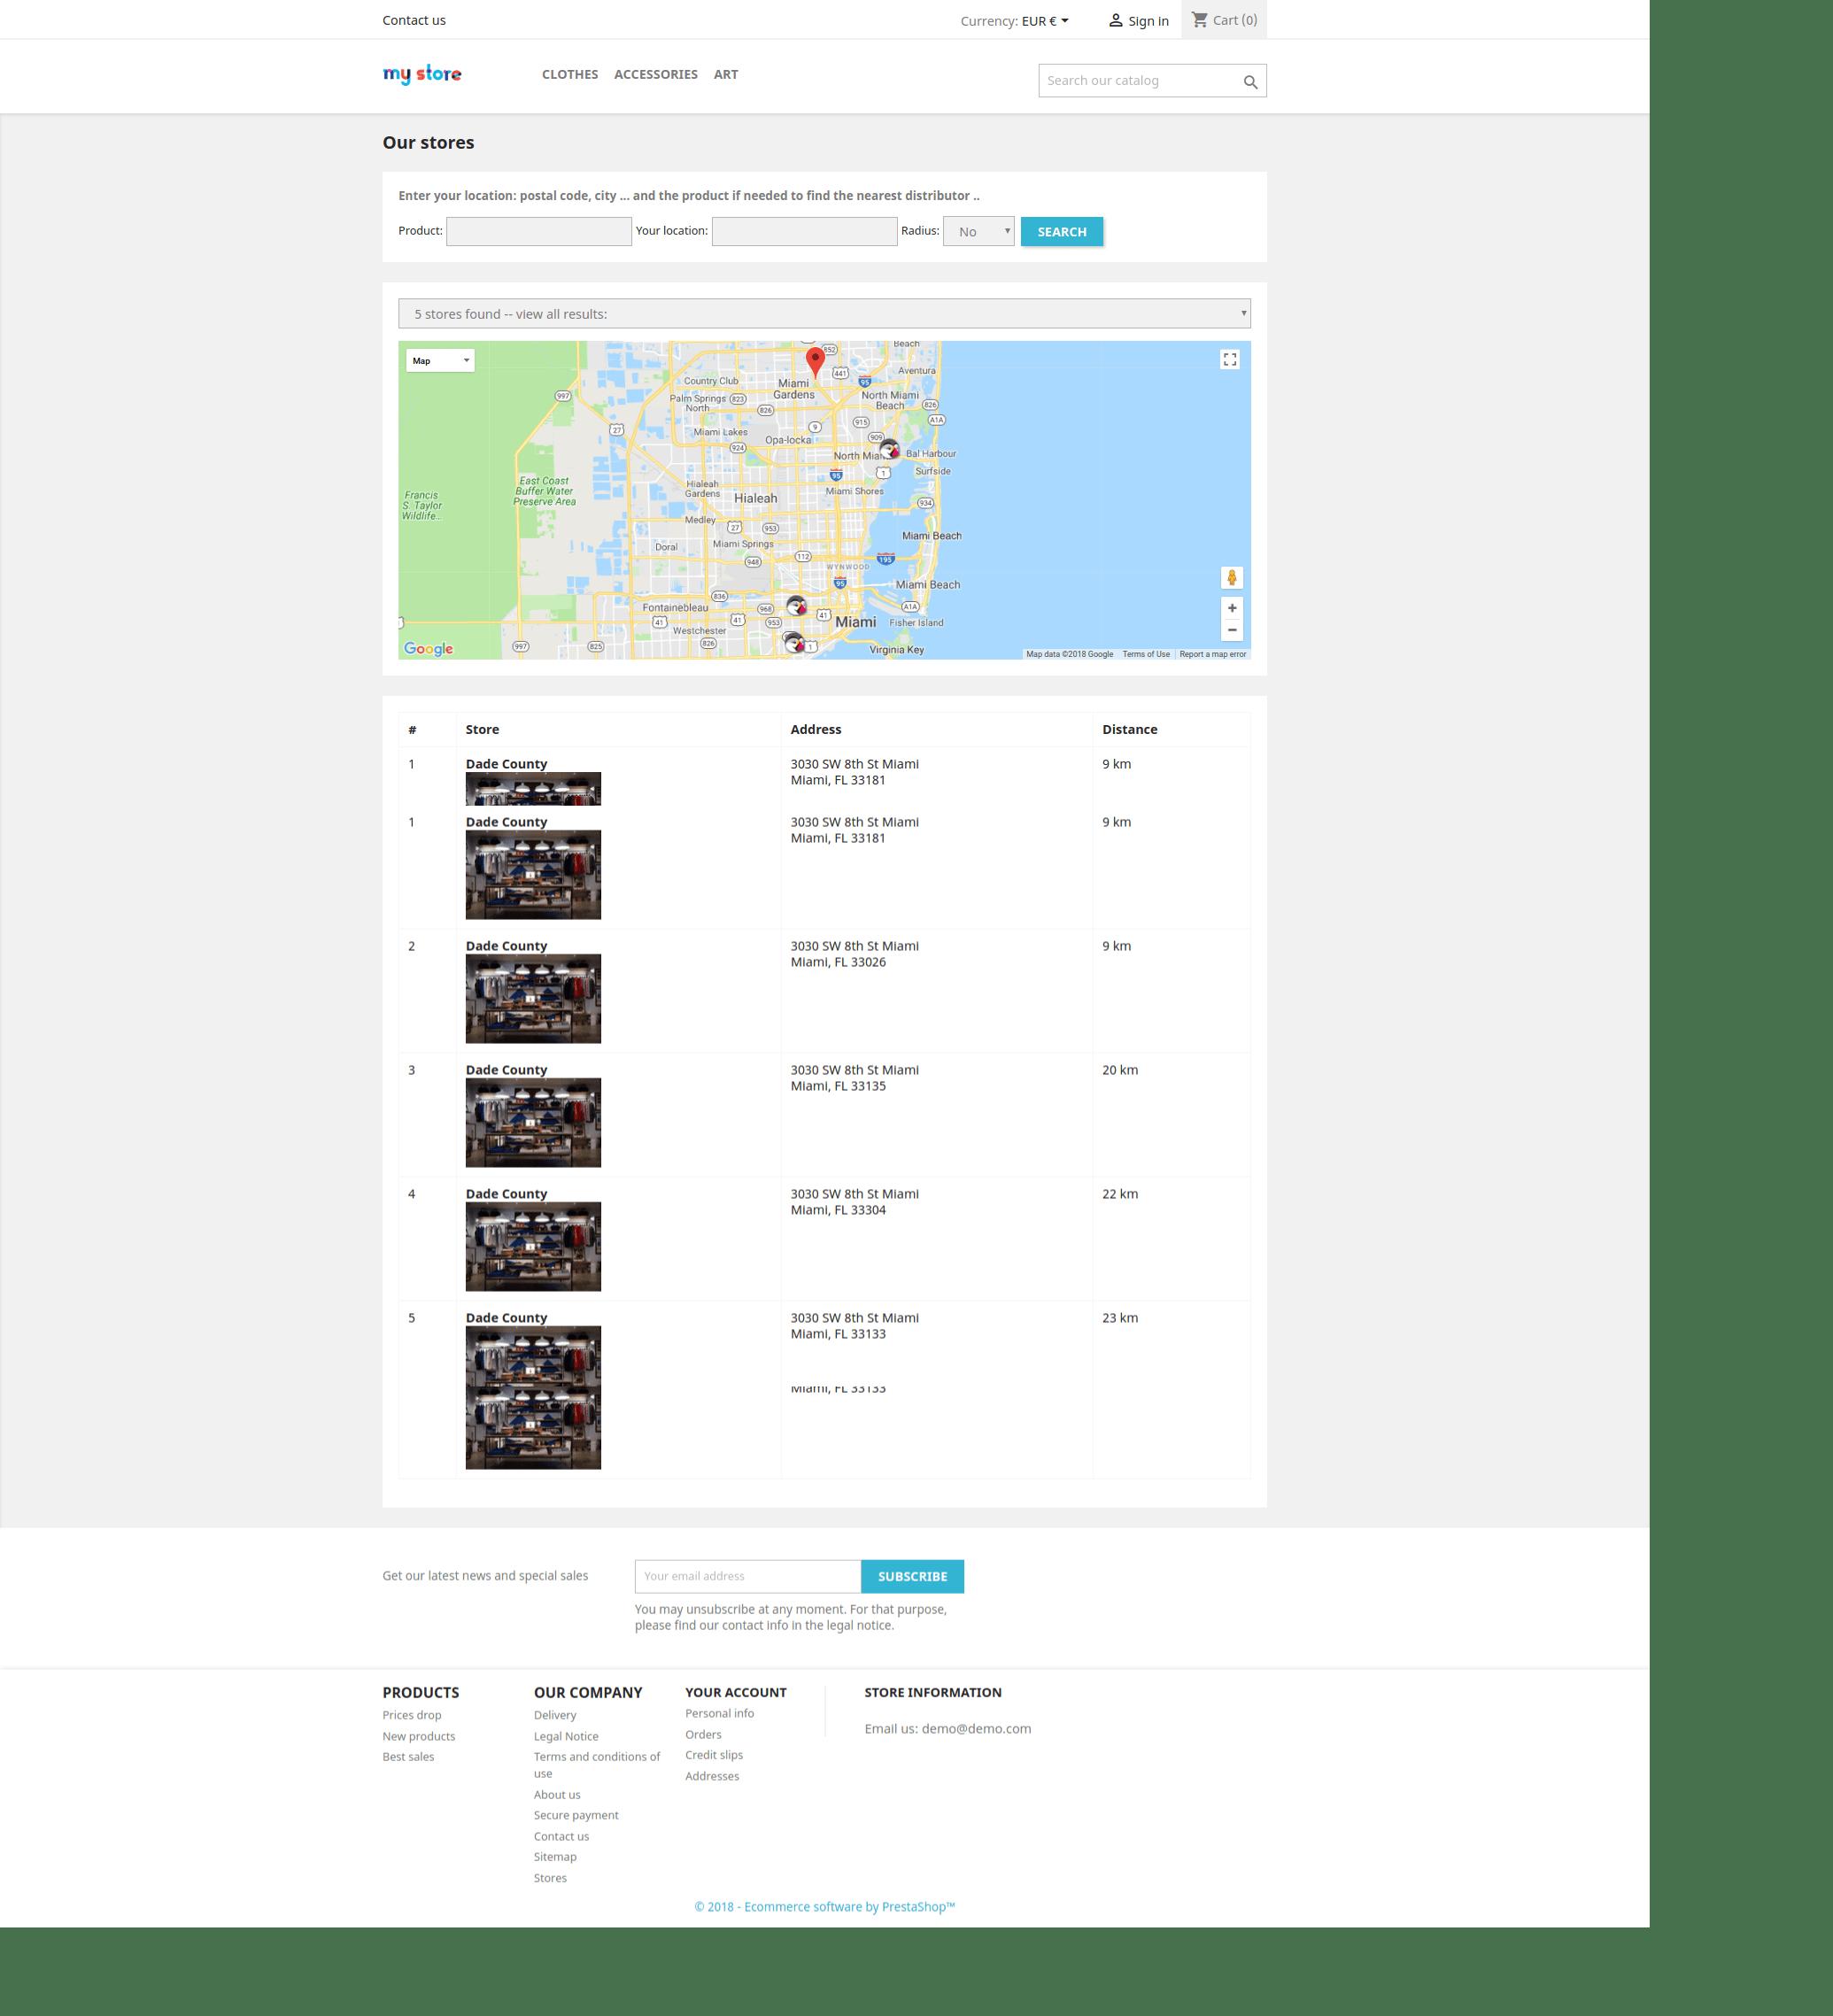 Store_locator_module